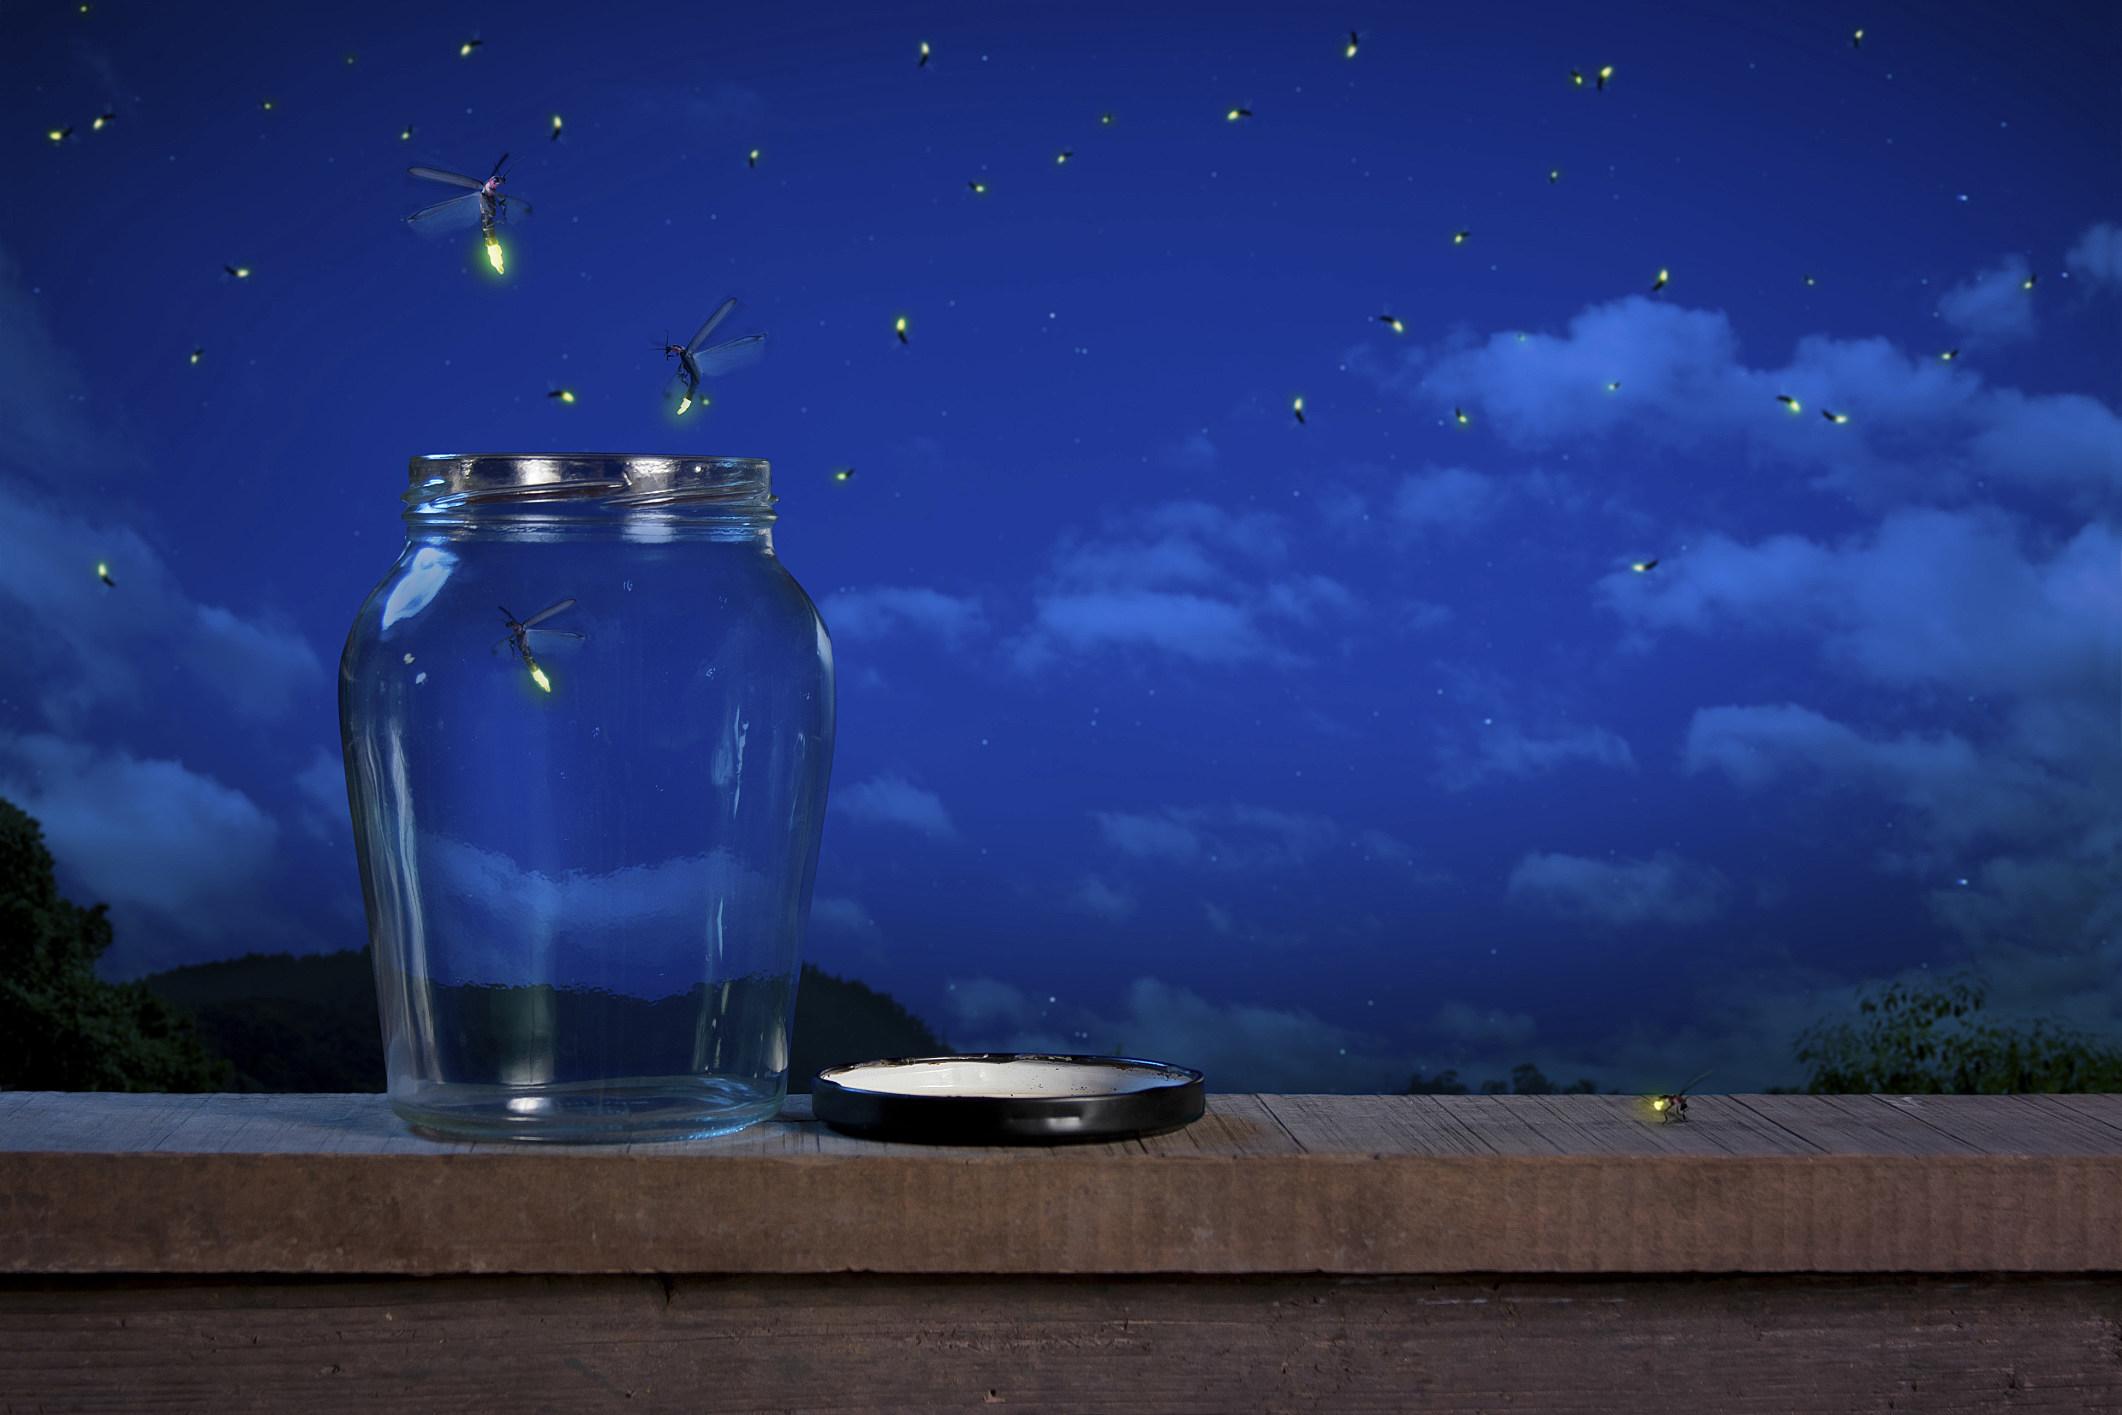 Firefly fergregory